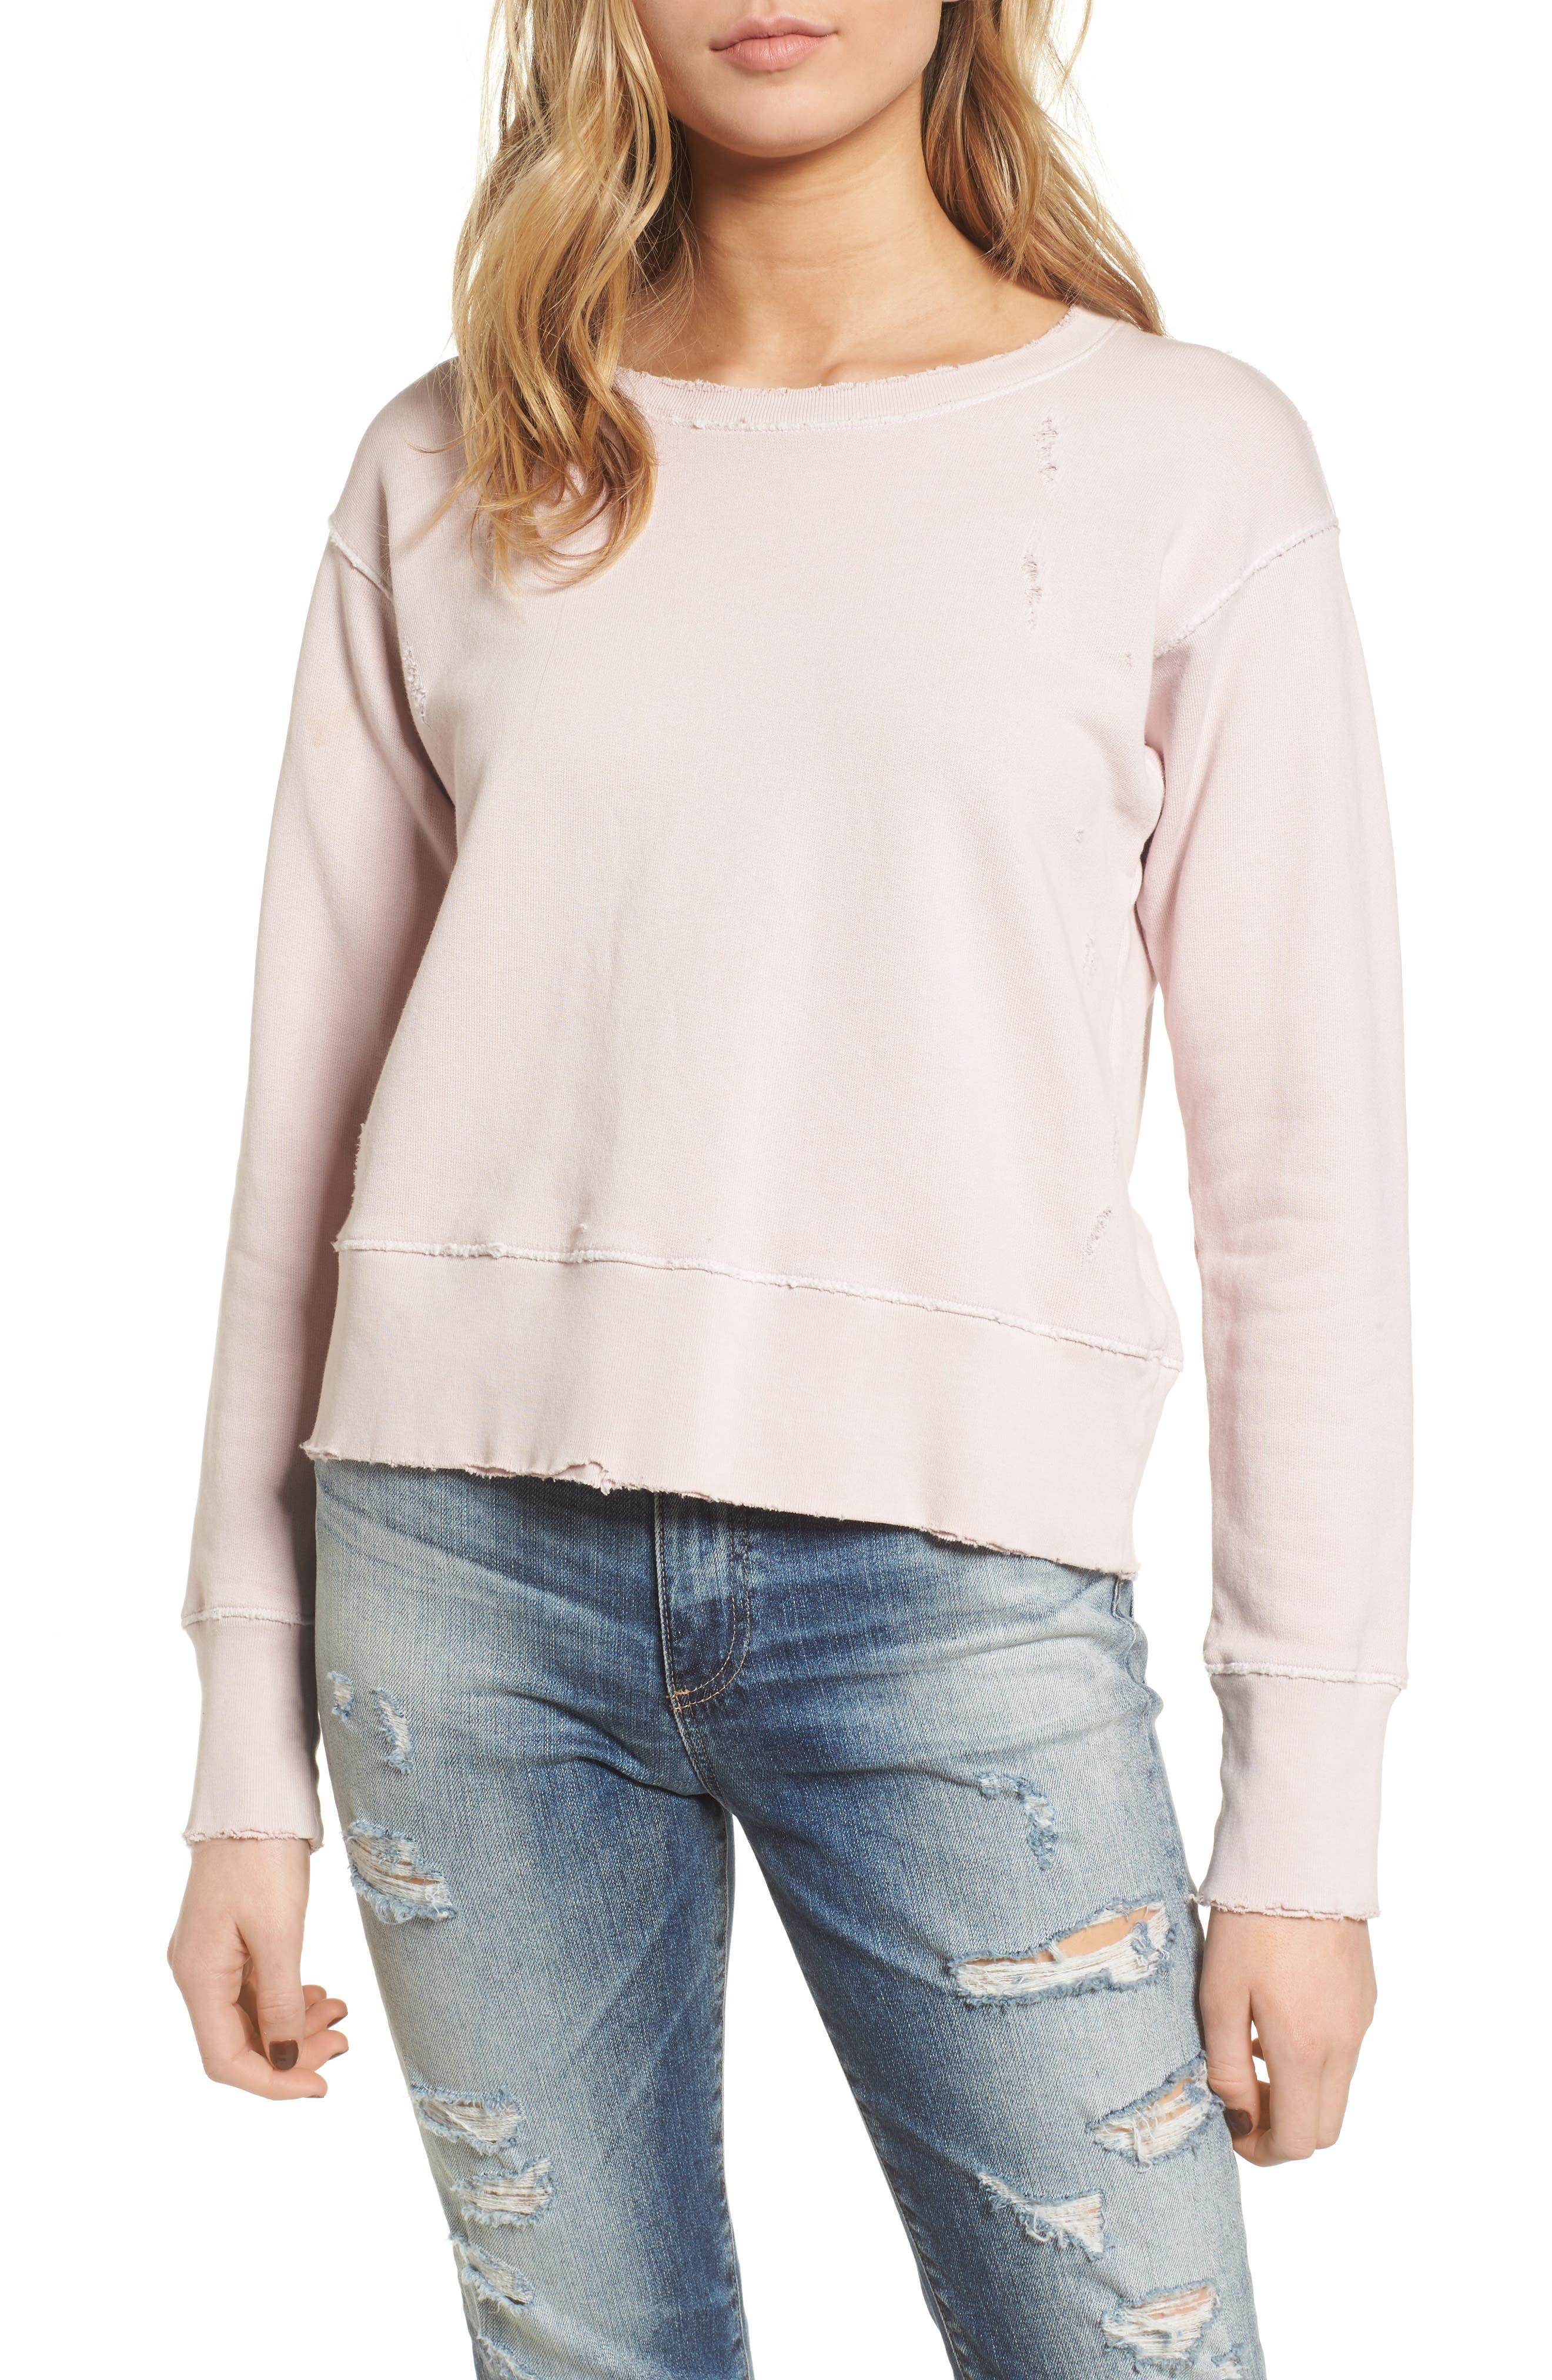 Frank & Eileen Tee Lab Cotton Sweatshirt